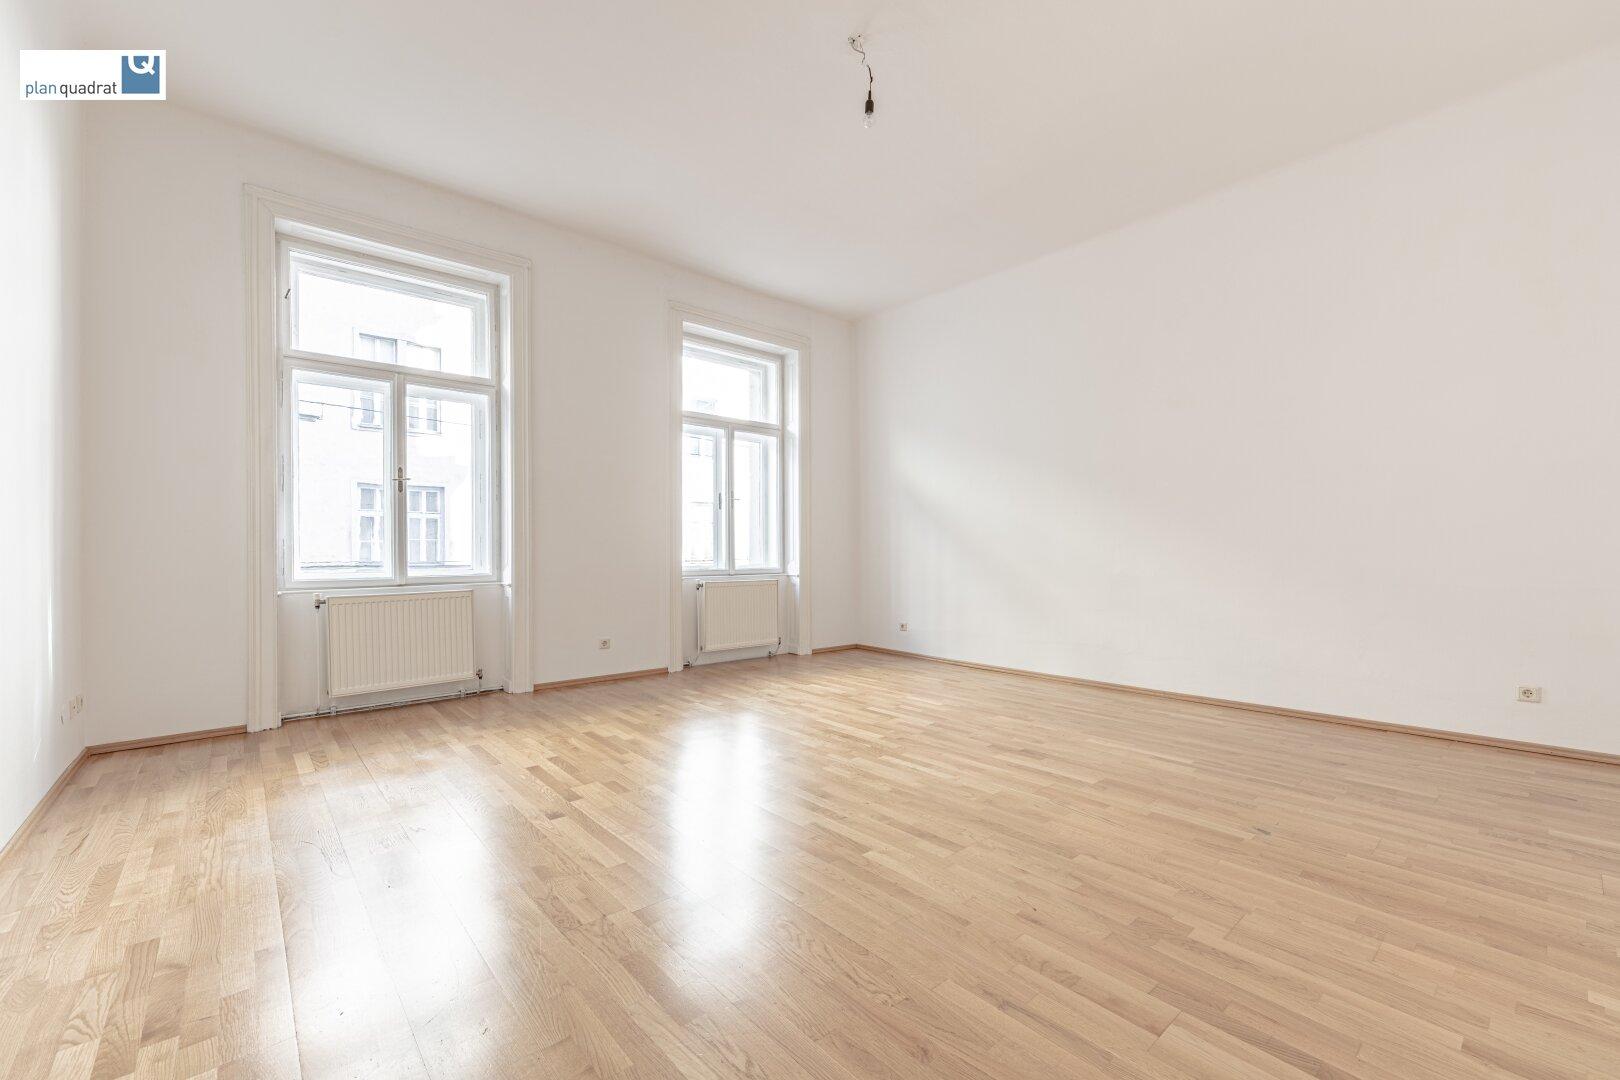 Zimmer 1 (gem. Wohnungsgrundriss; zentral begehbar)